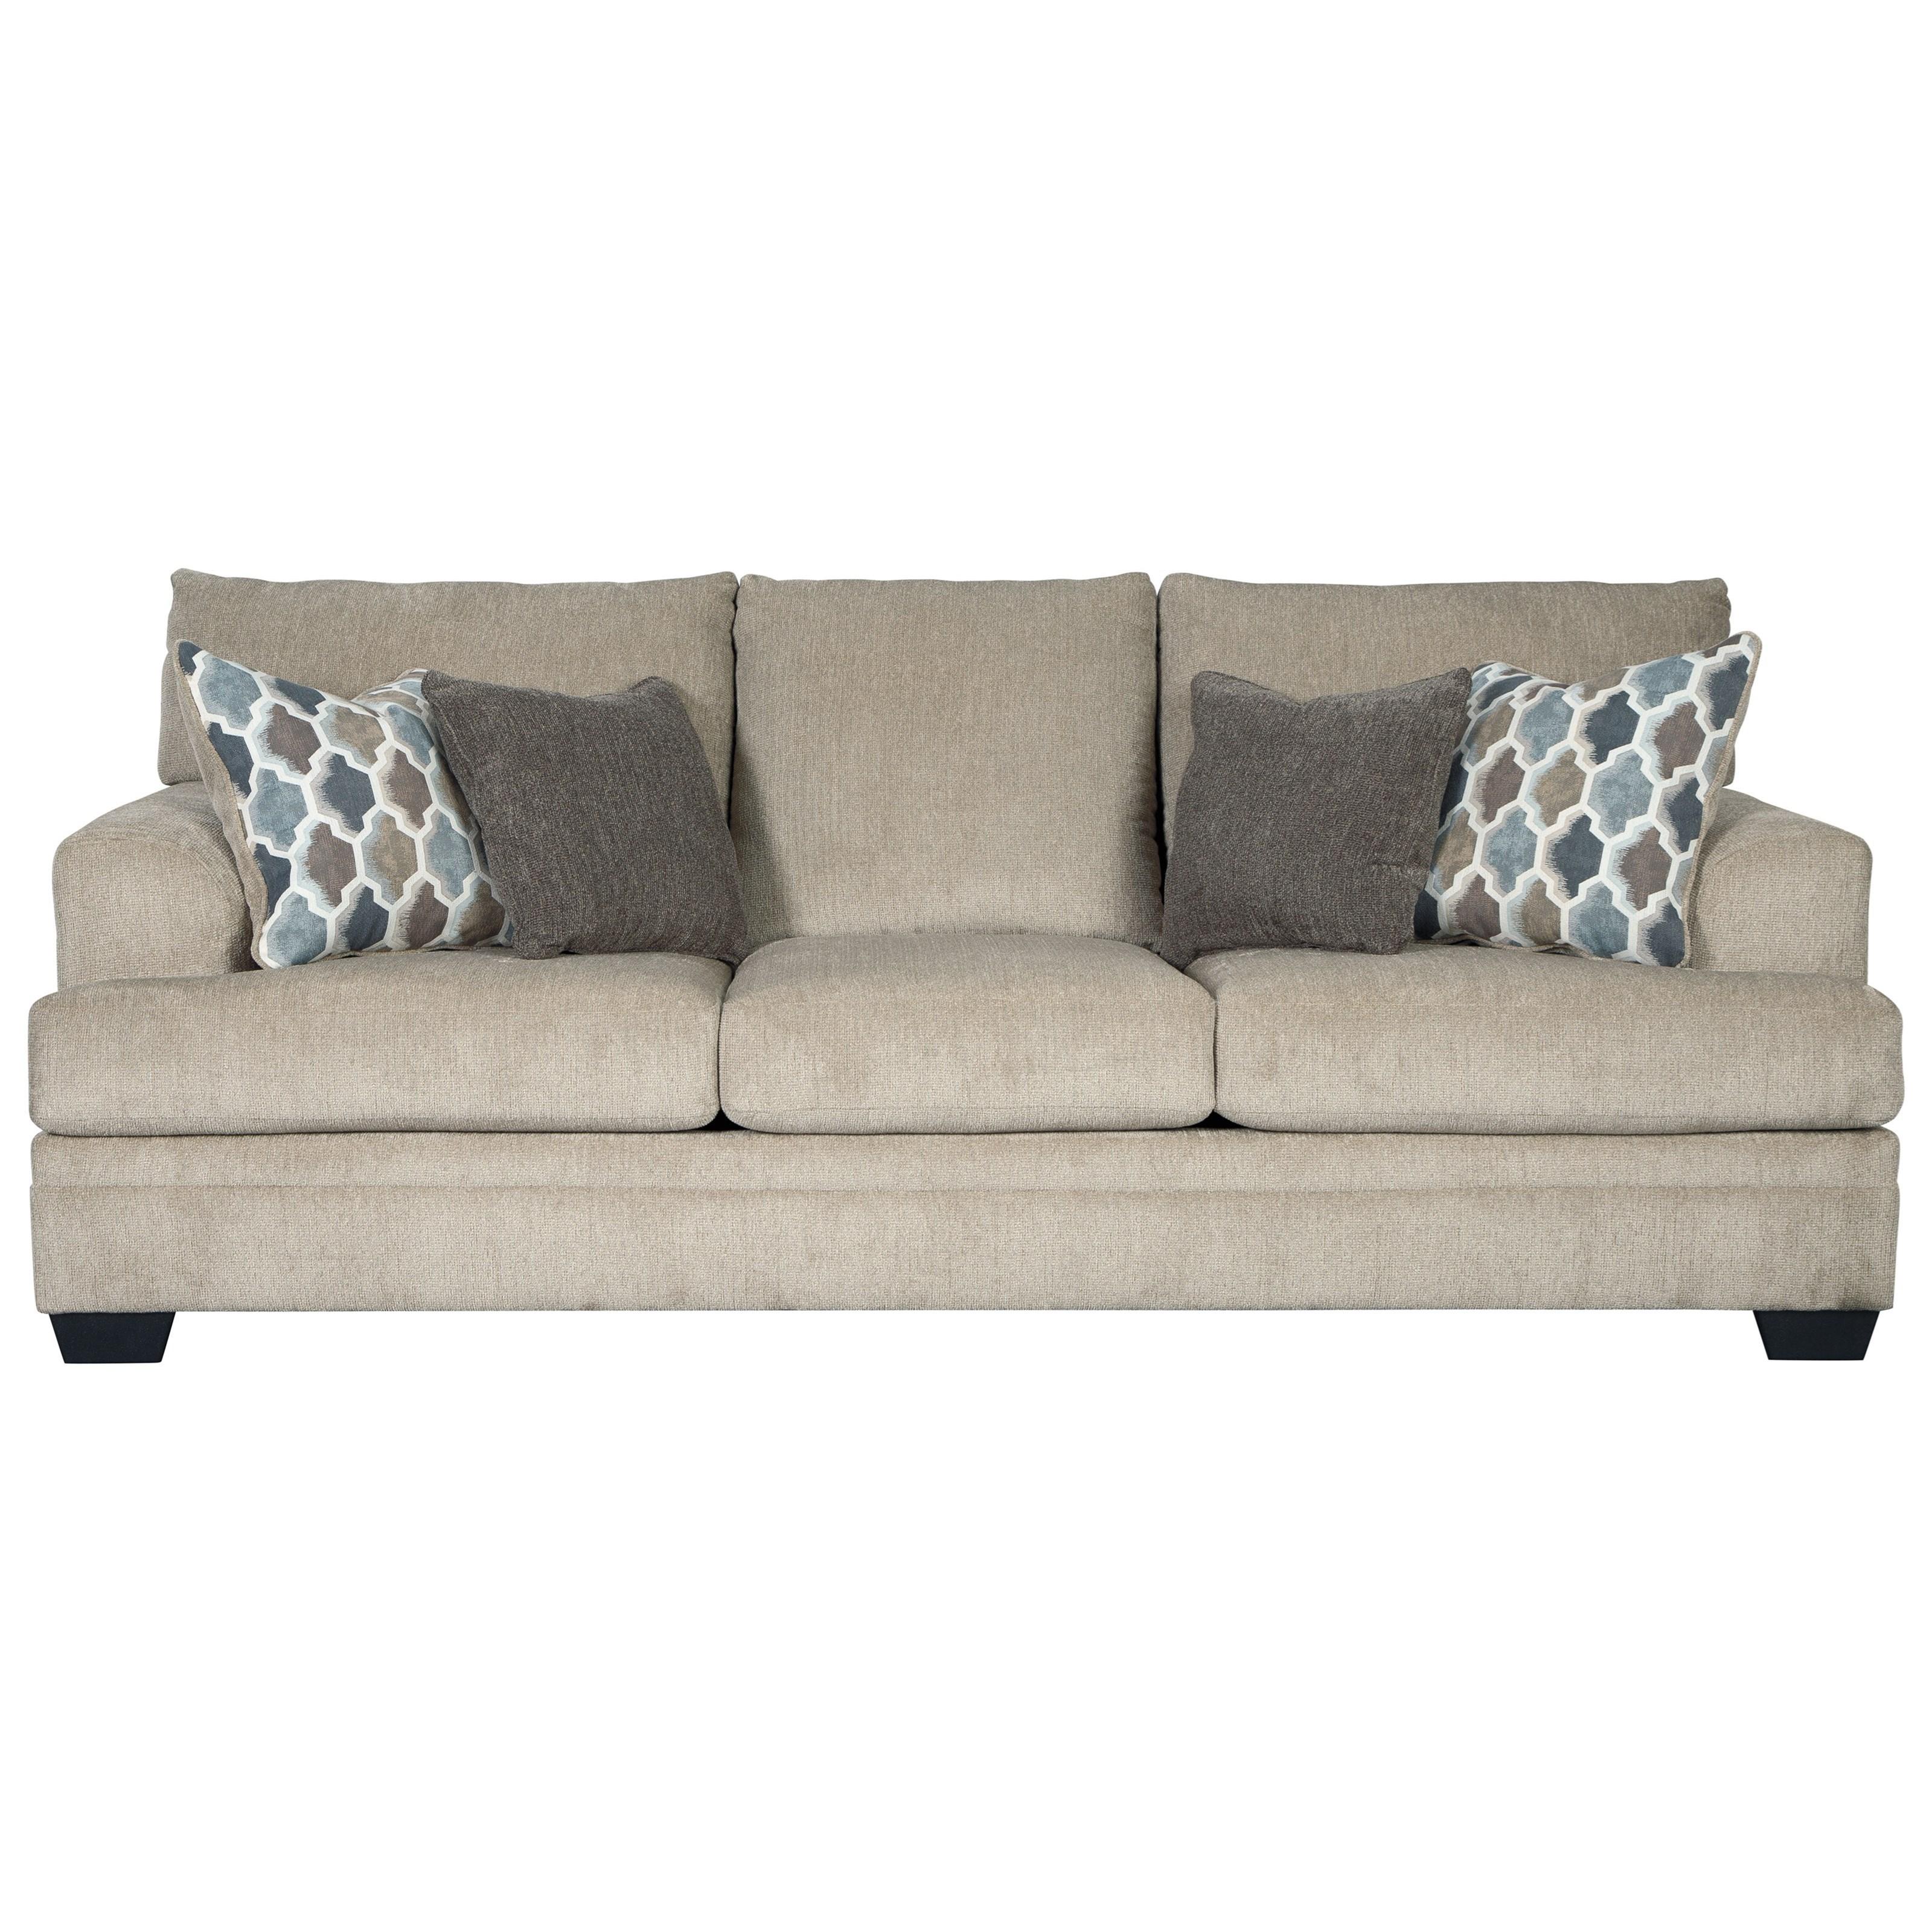 Dorsten Sofa by Ashley (Signature Design) at Johnny Janosik